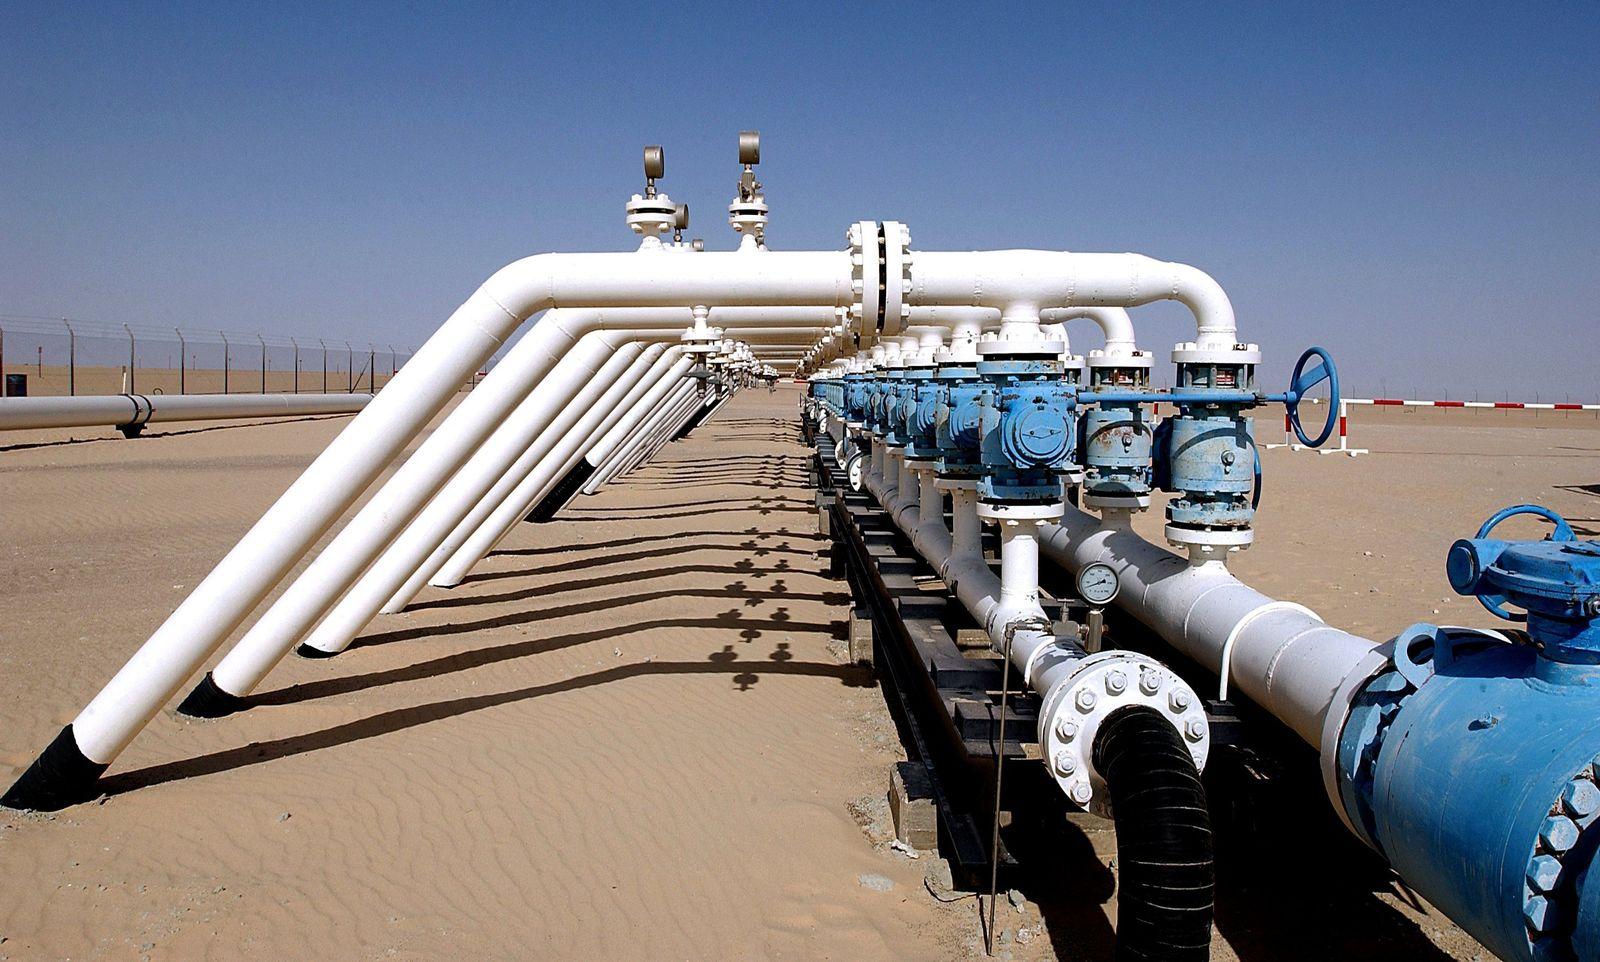 Gewalt in Libyen treibt Ölpreise / Öl / Wintershall